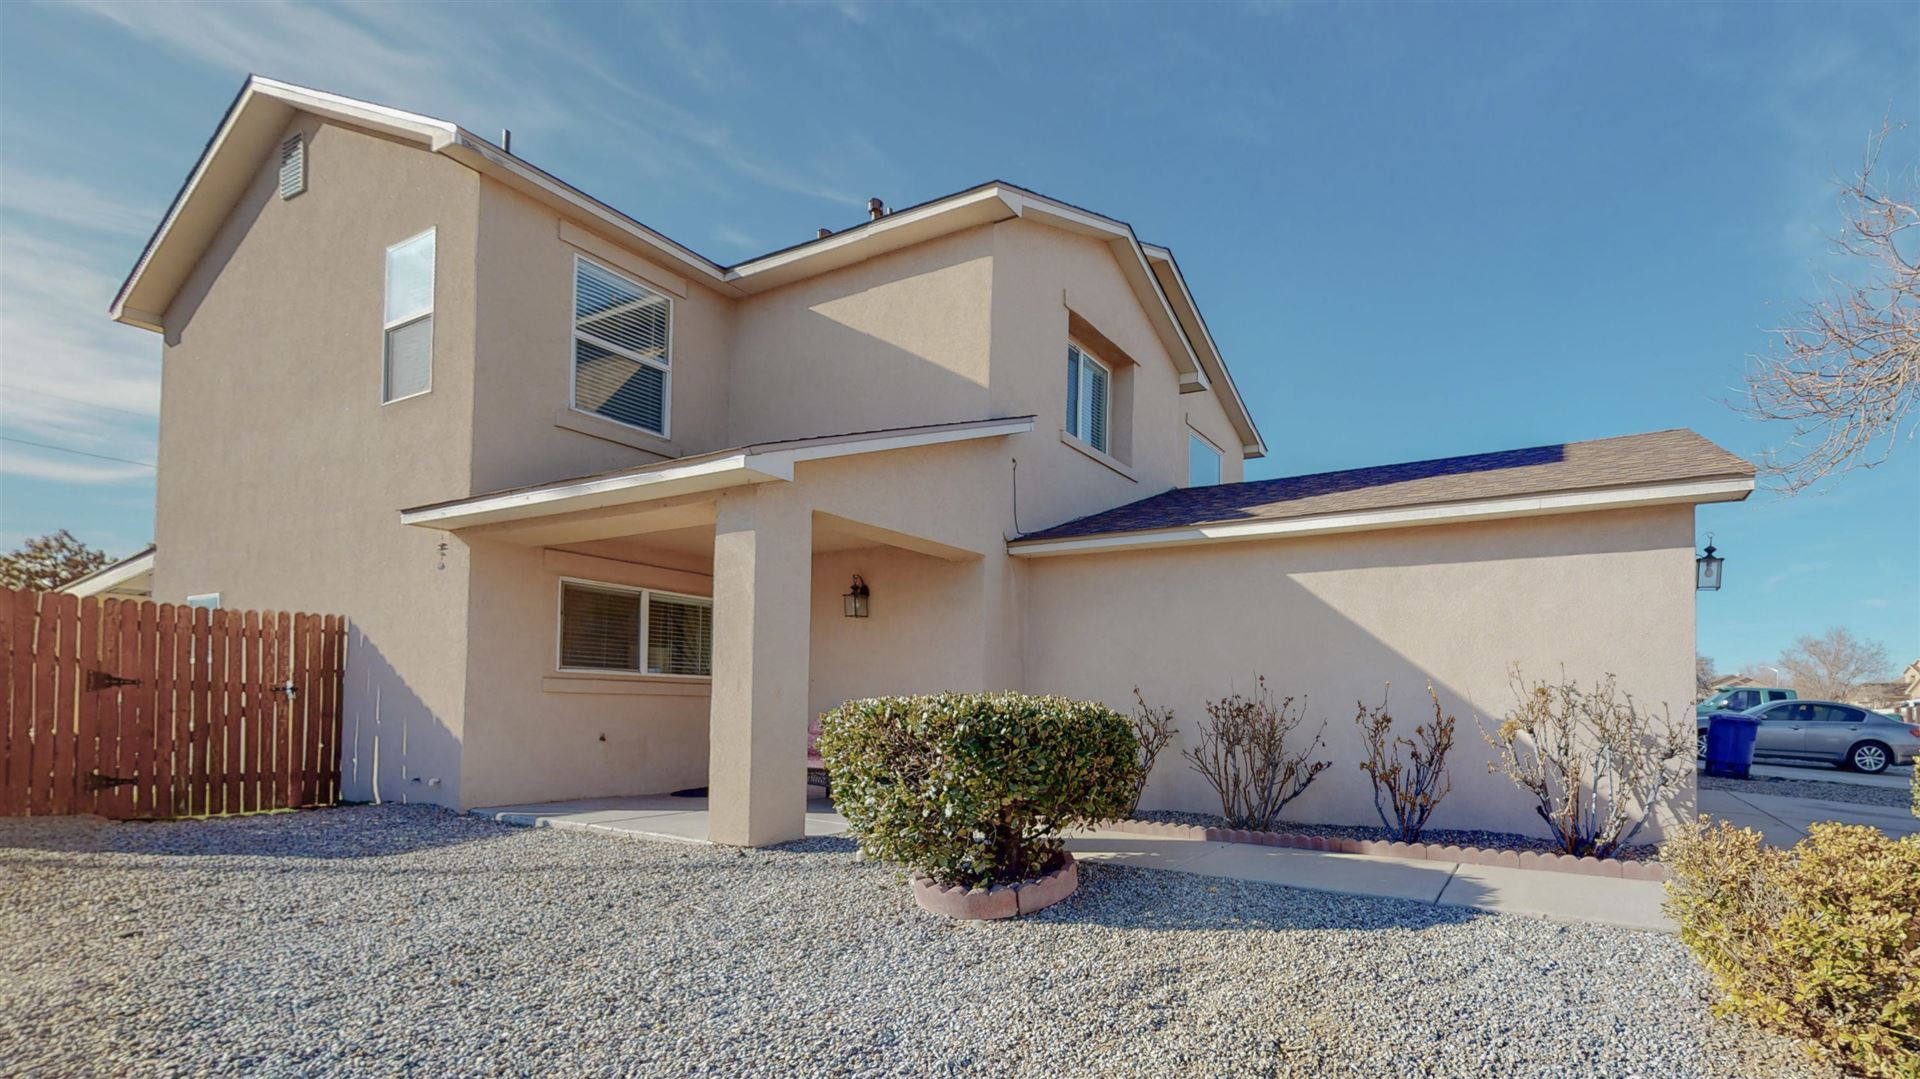 439 DESERT ROCK Drive SW, Albuquerque, NM 87121 - MLS#: 986492